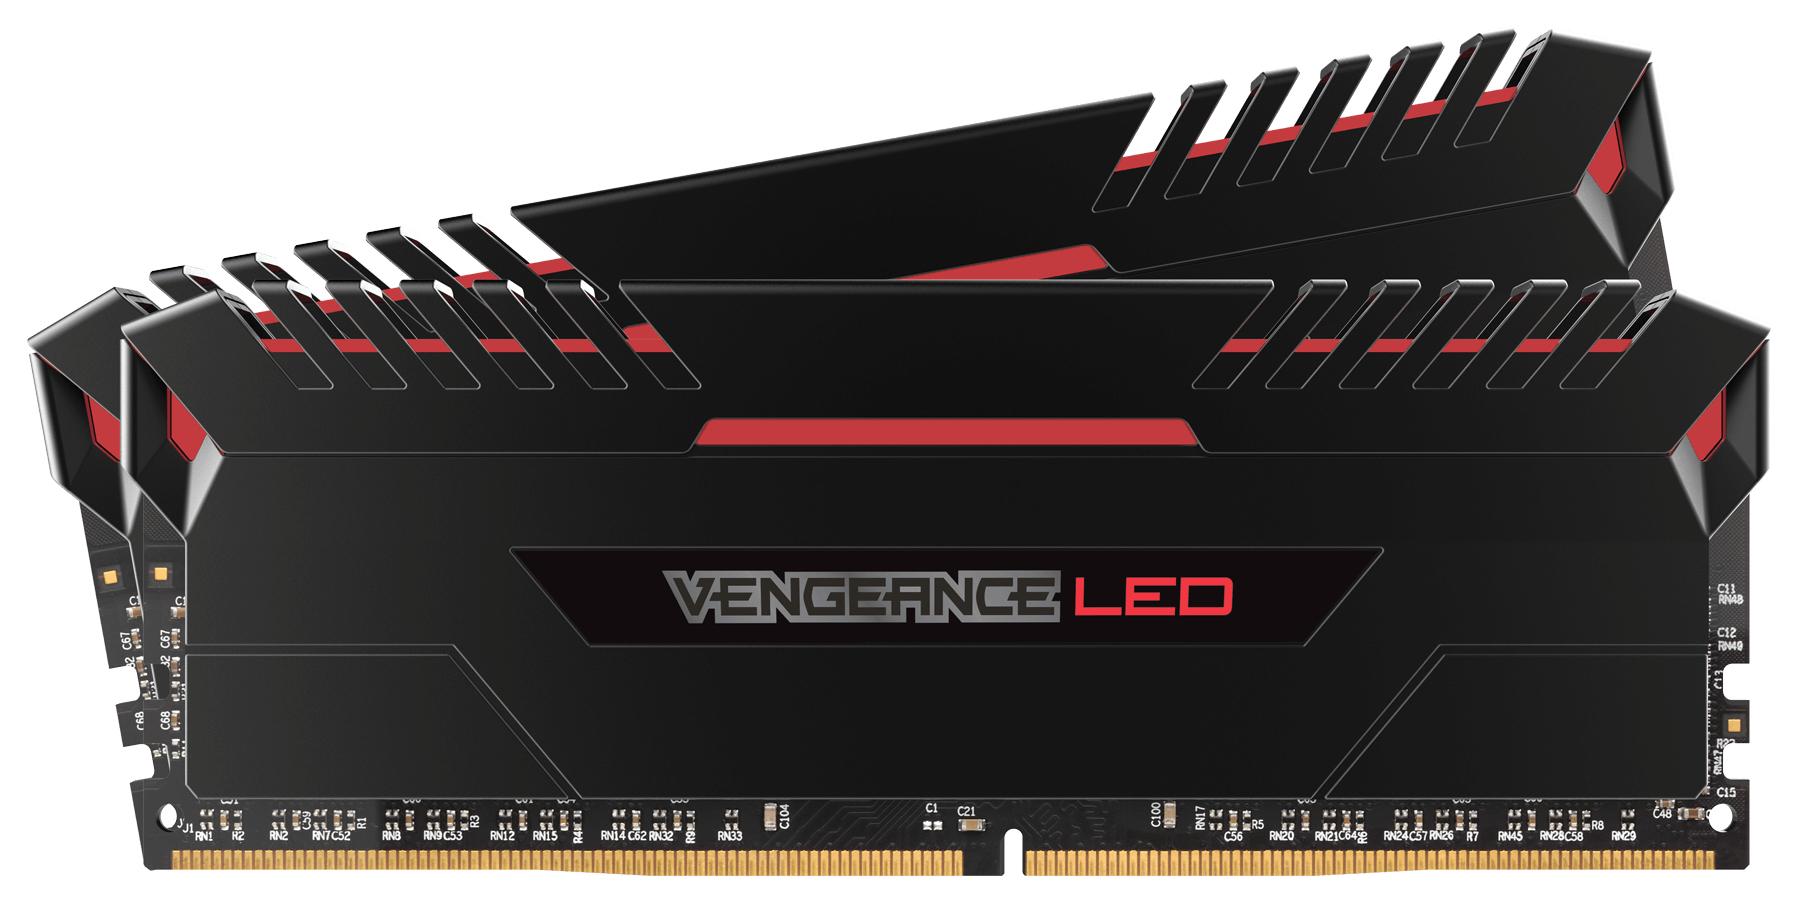 Corsair Vengeance LED 2x8GB DDR4-3000 16GB DDR4 3000MHz memory module